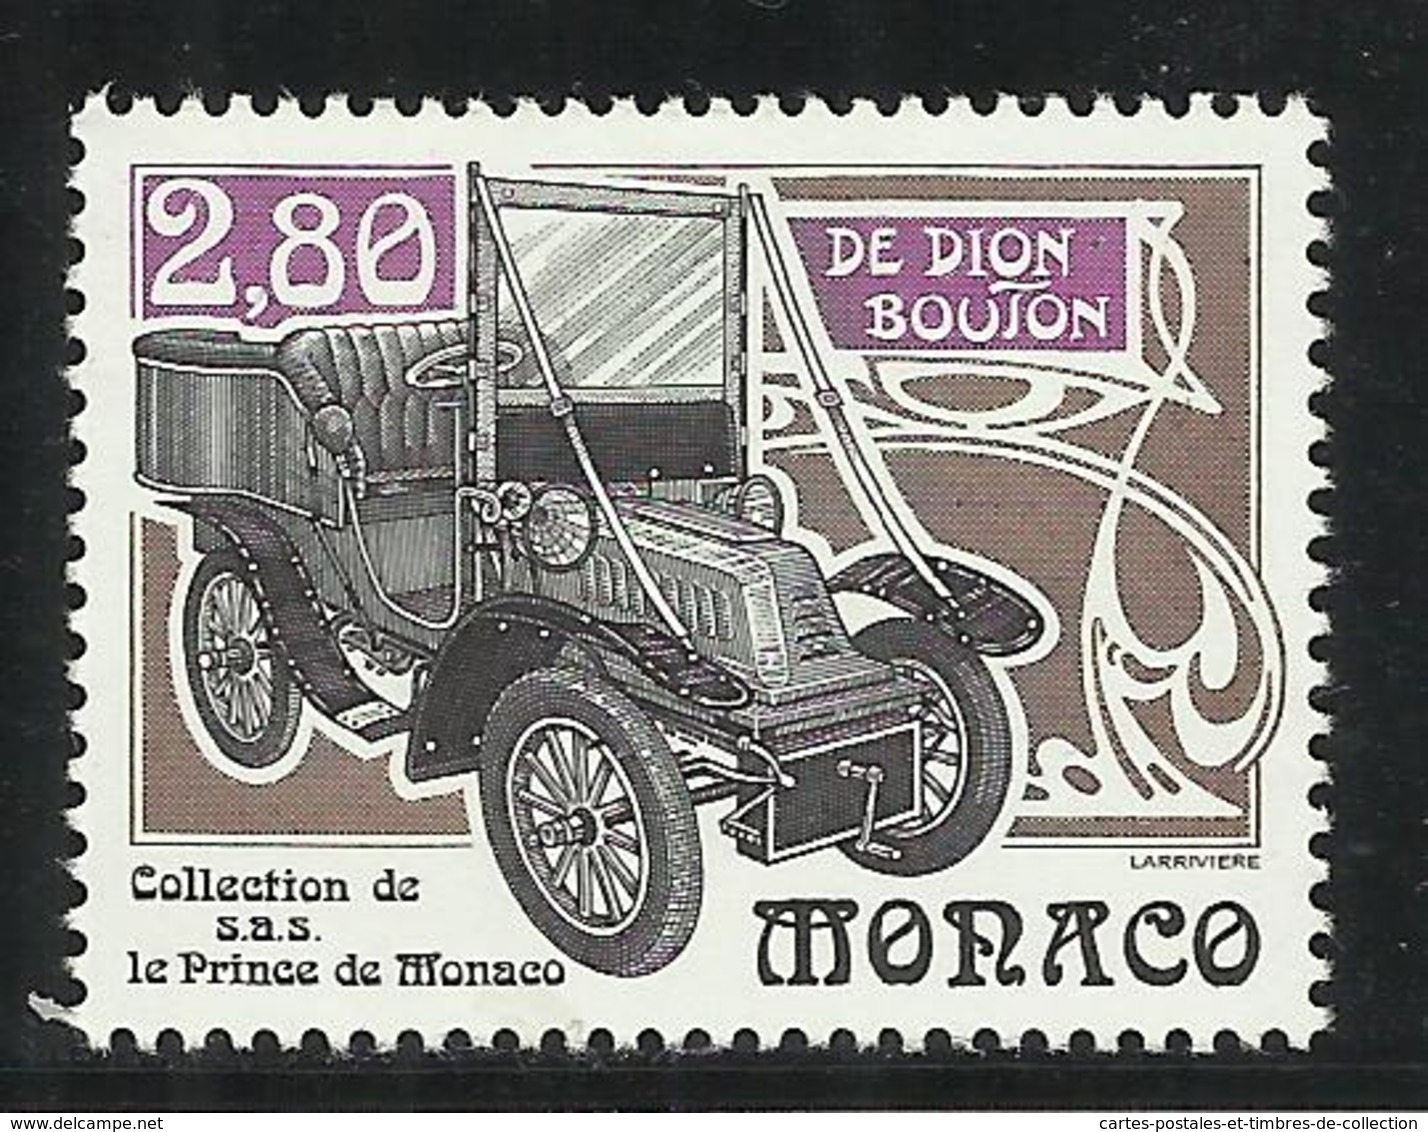 MONACO , 2.80 Frs , Collection De Voitures Anciennes De S.A.S. Rainier III , 1994 , N° YT 1942 , NEUF ** - Monaco